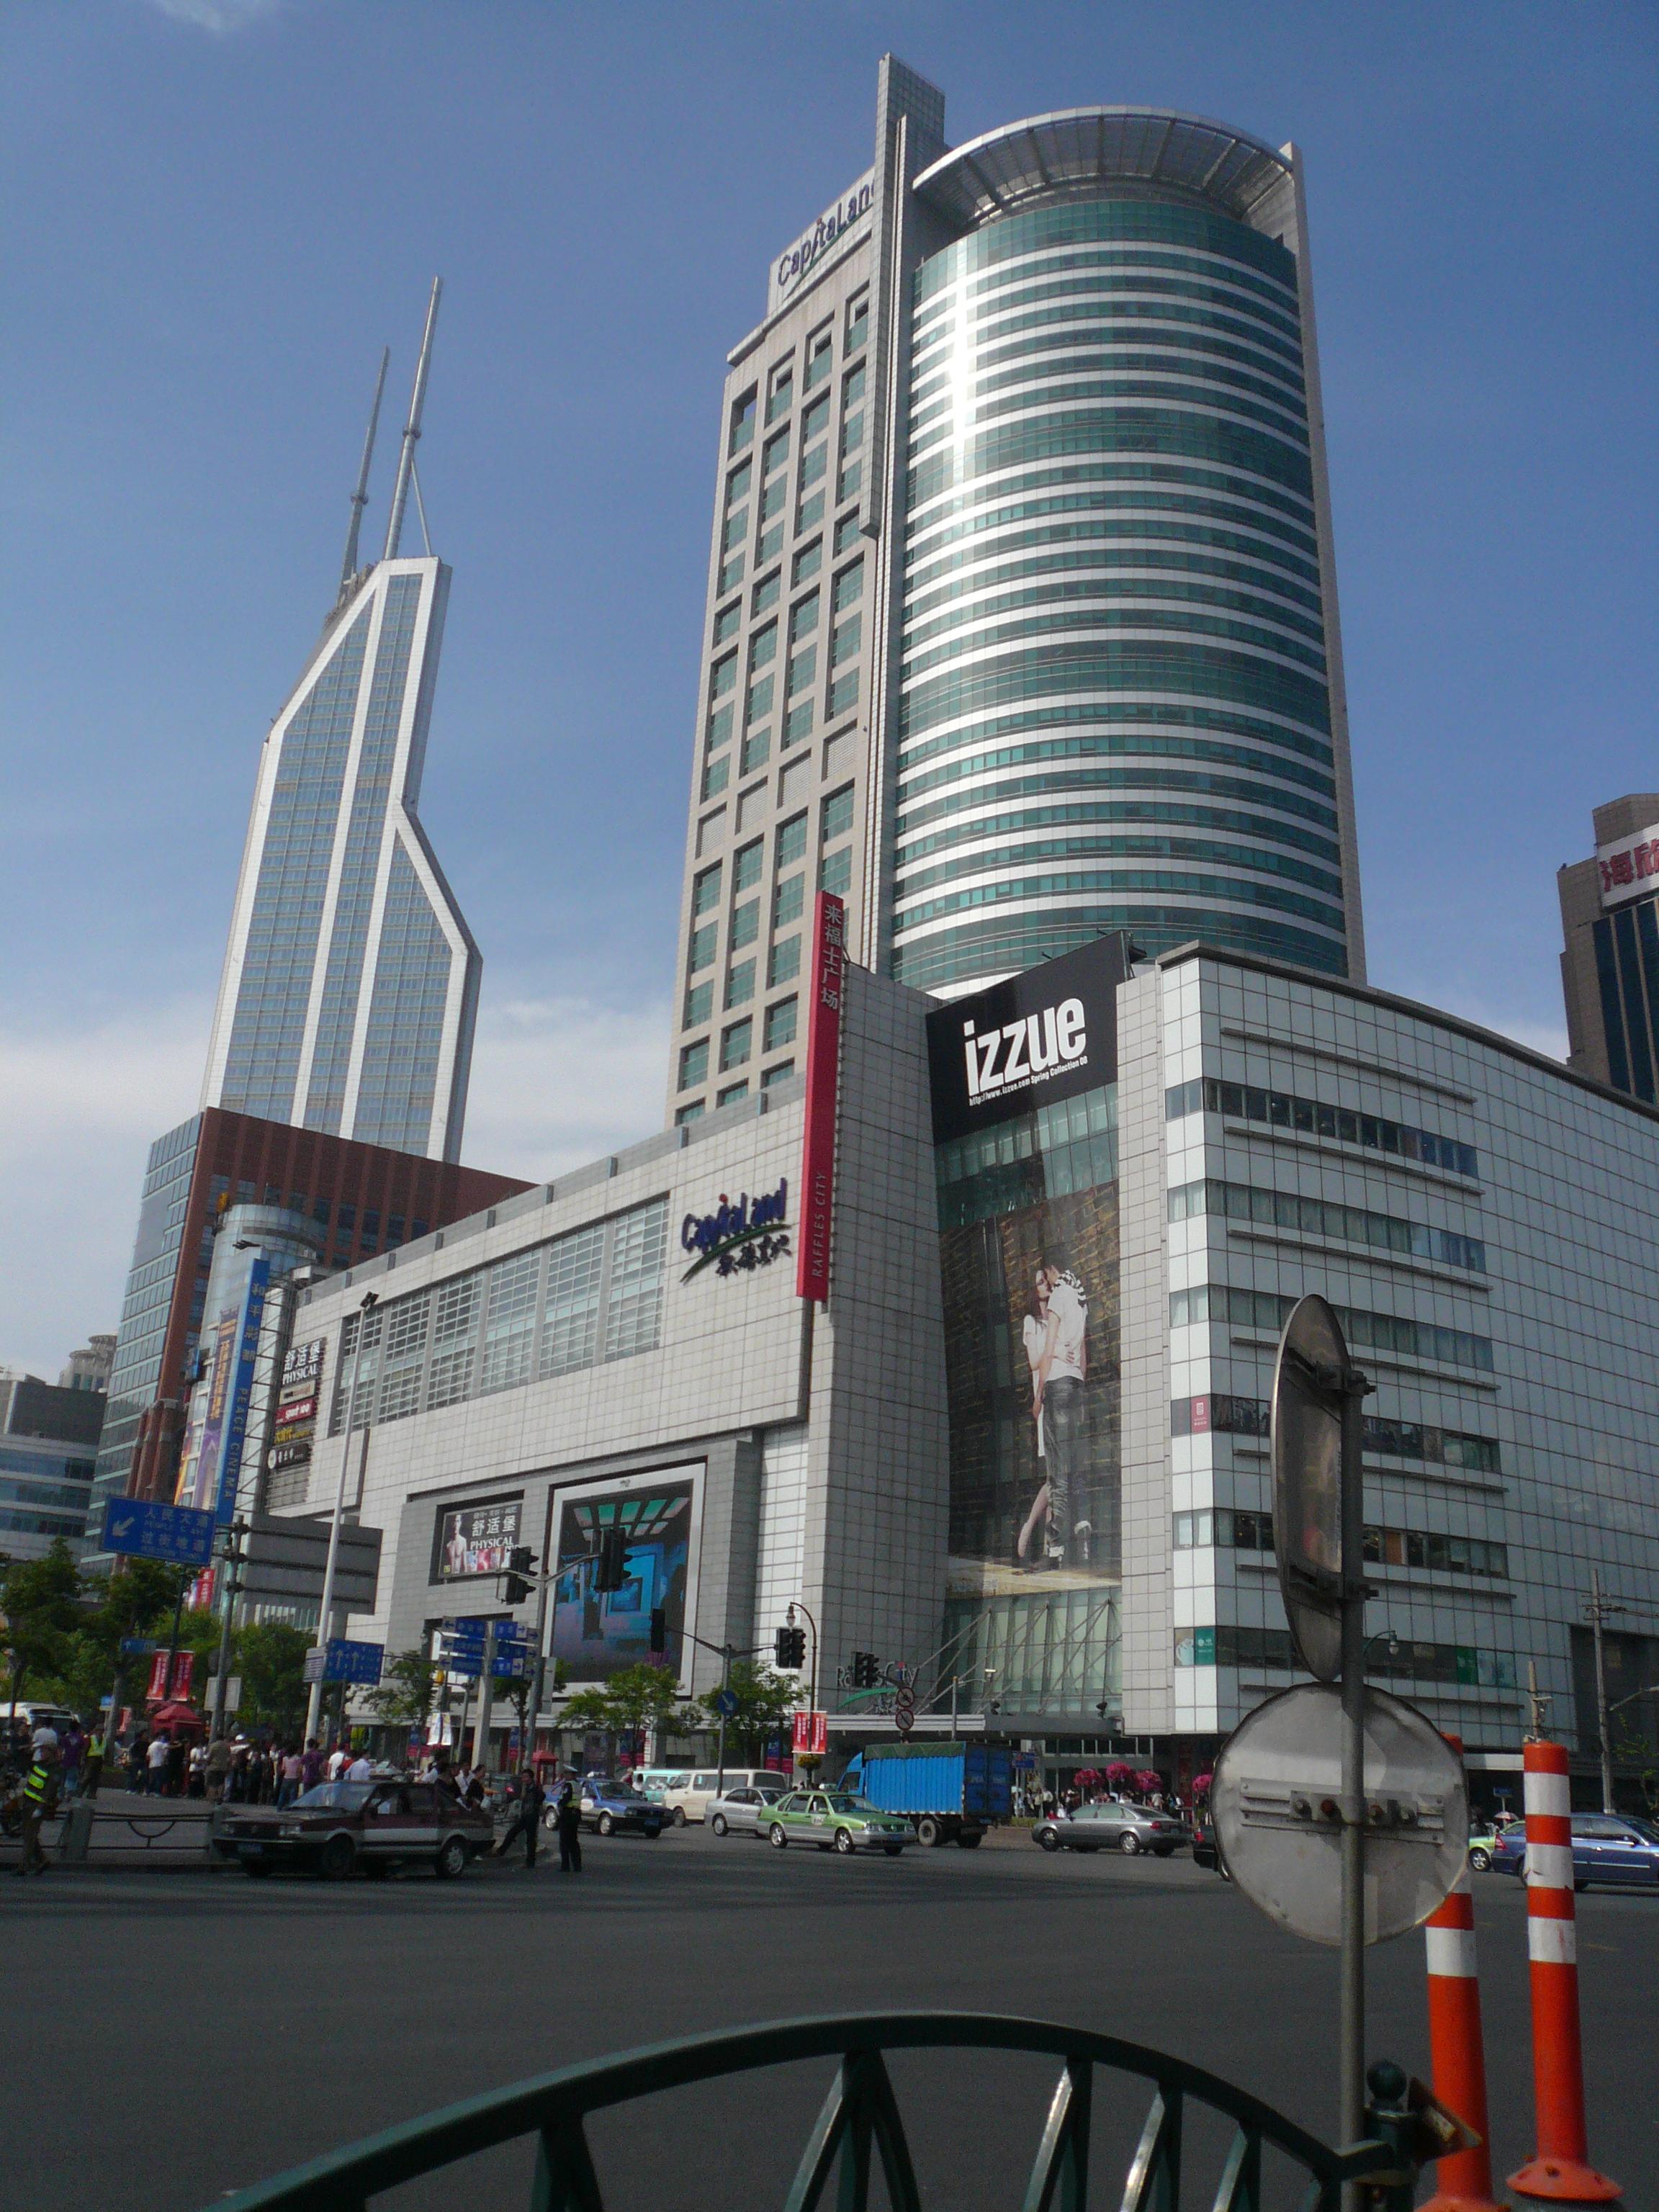 FilePeoples Square Huangpu Shanghai China 200000